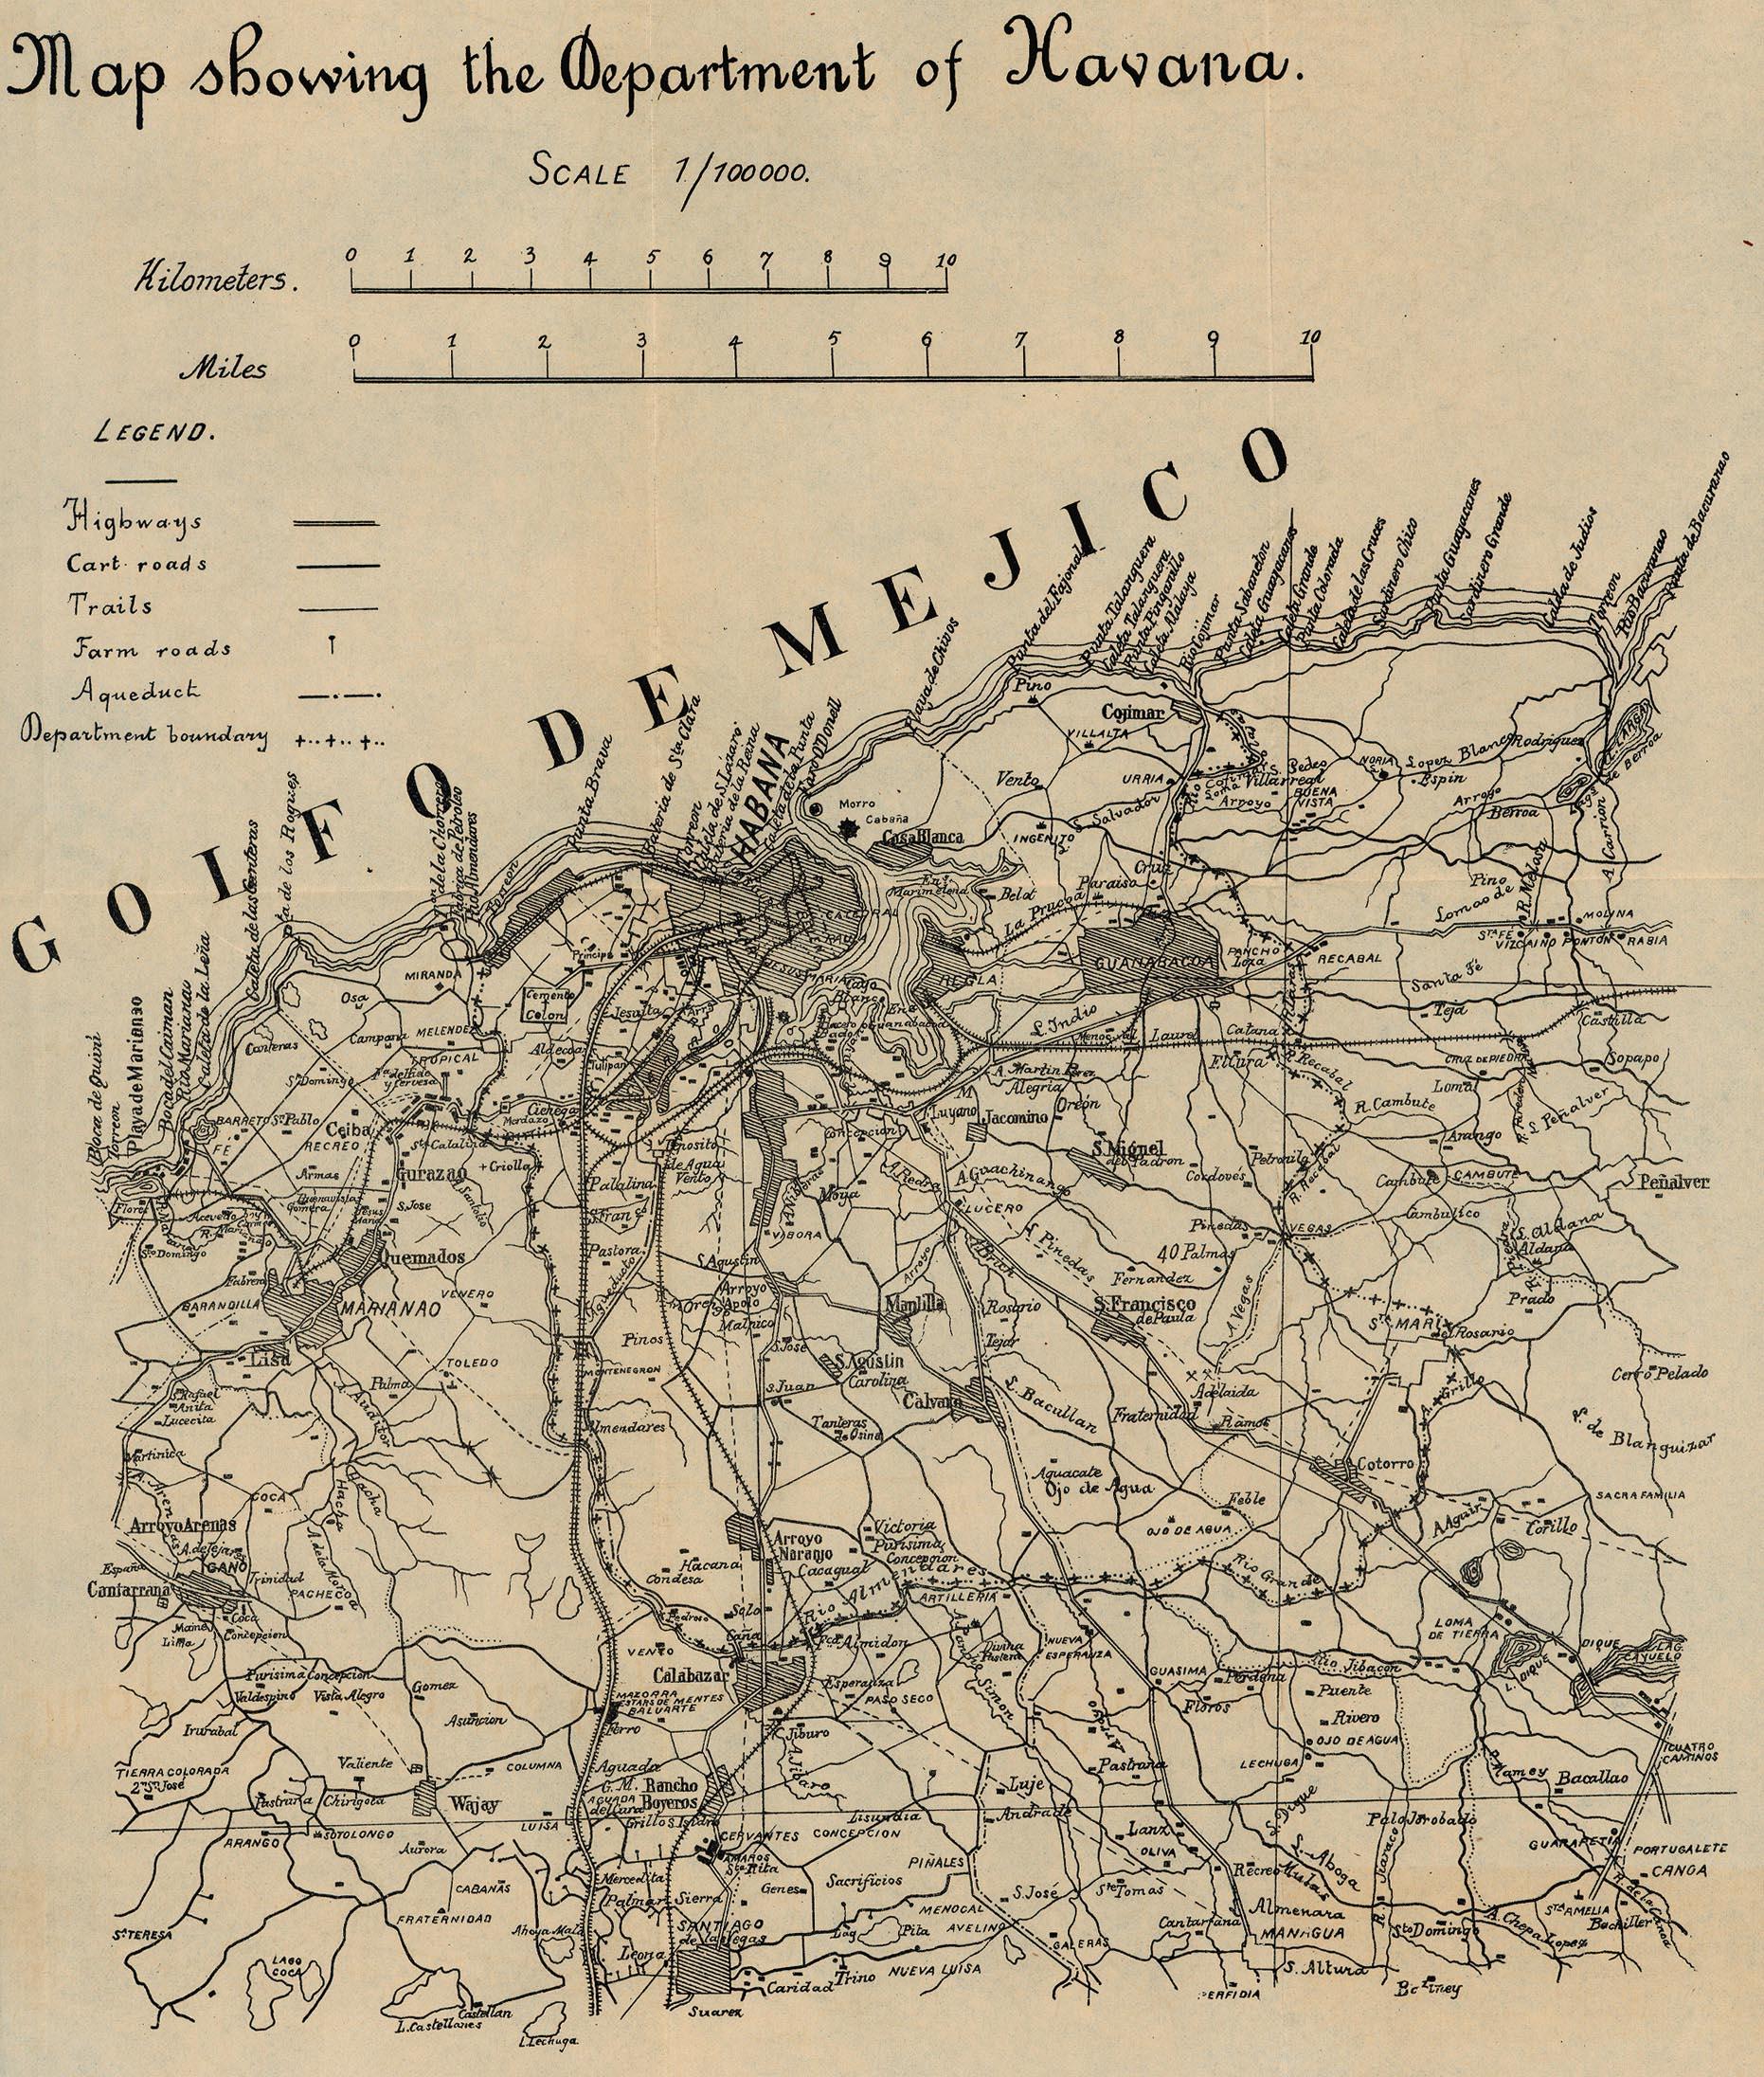 Mapa del Departamento de La Habana, Cuba 1899